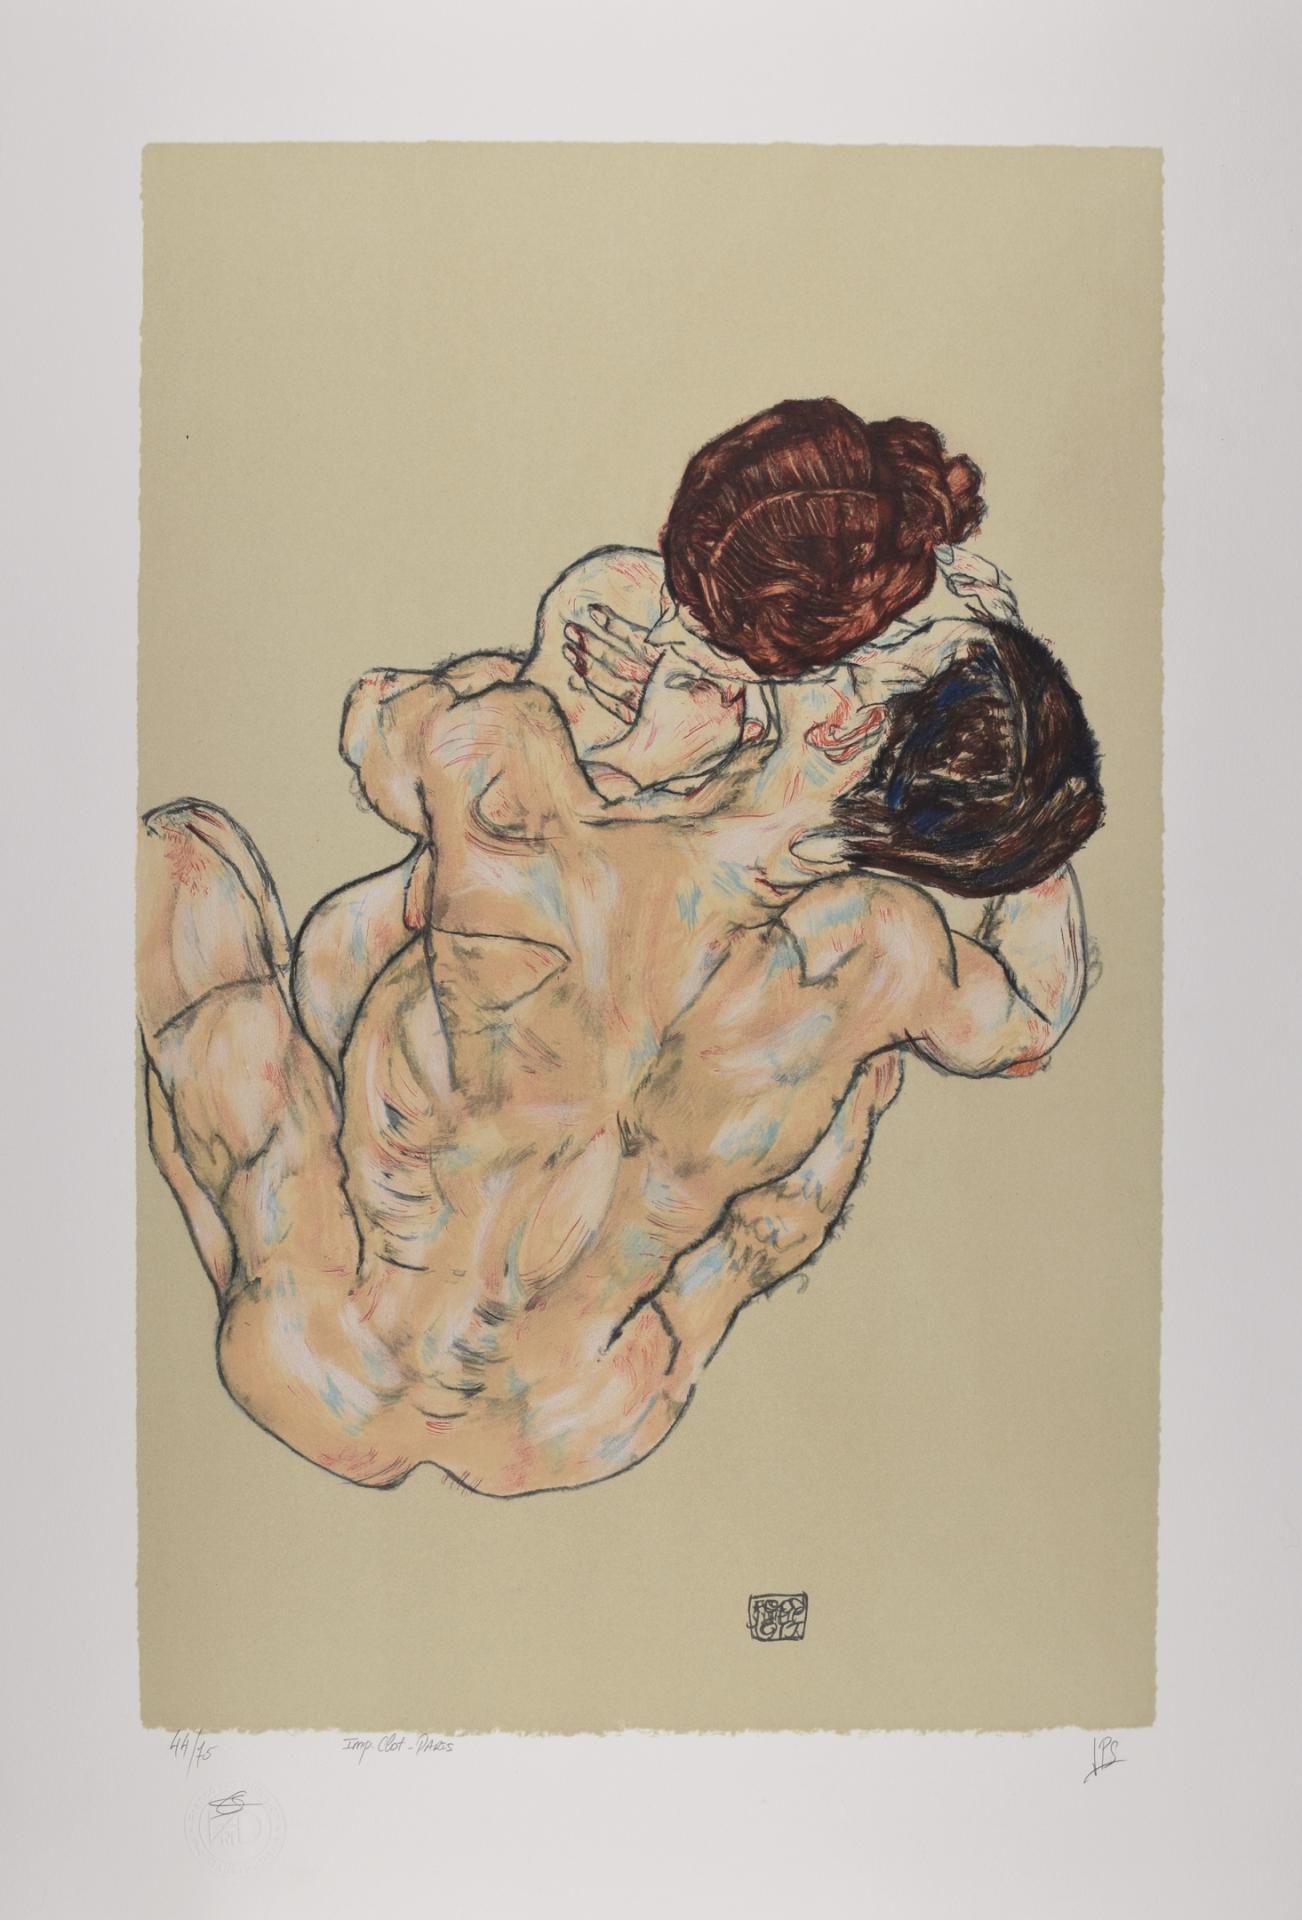 EGON SCHIELE | Mann und Frau, 1917 | Lithograph